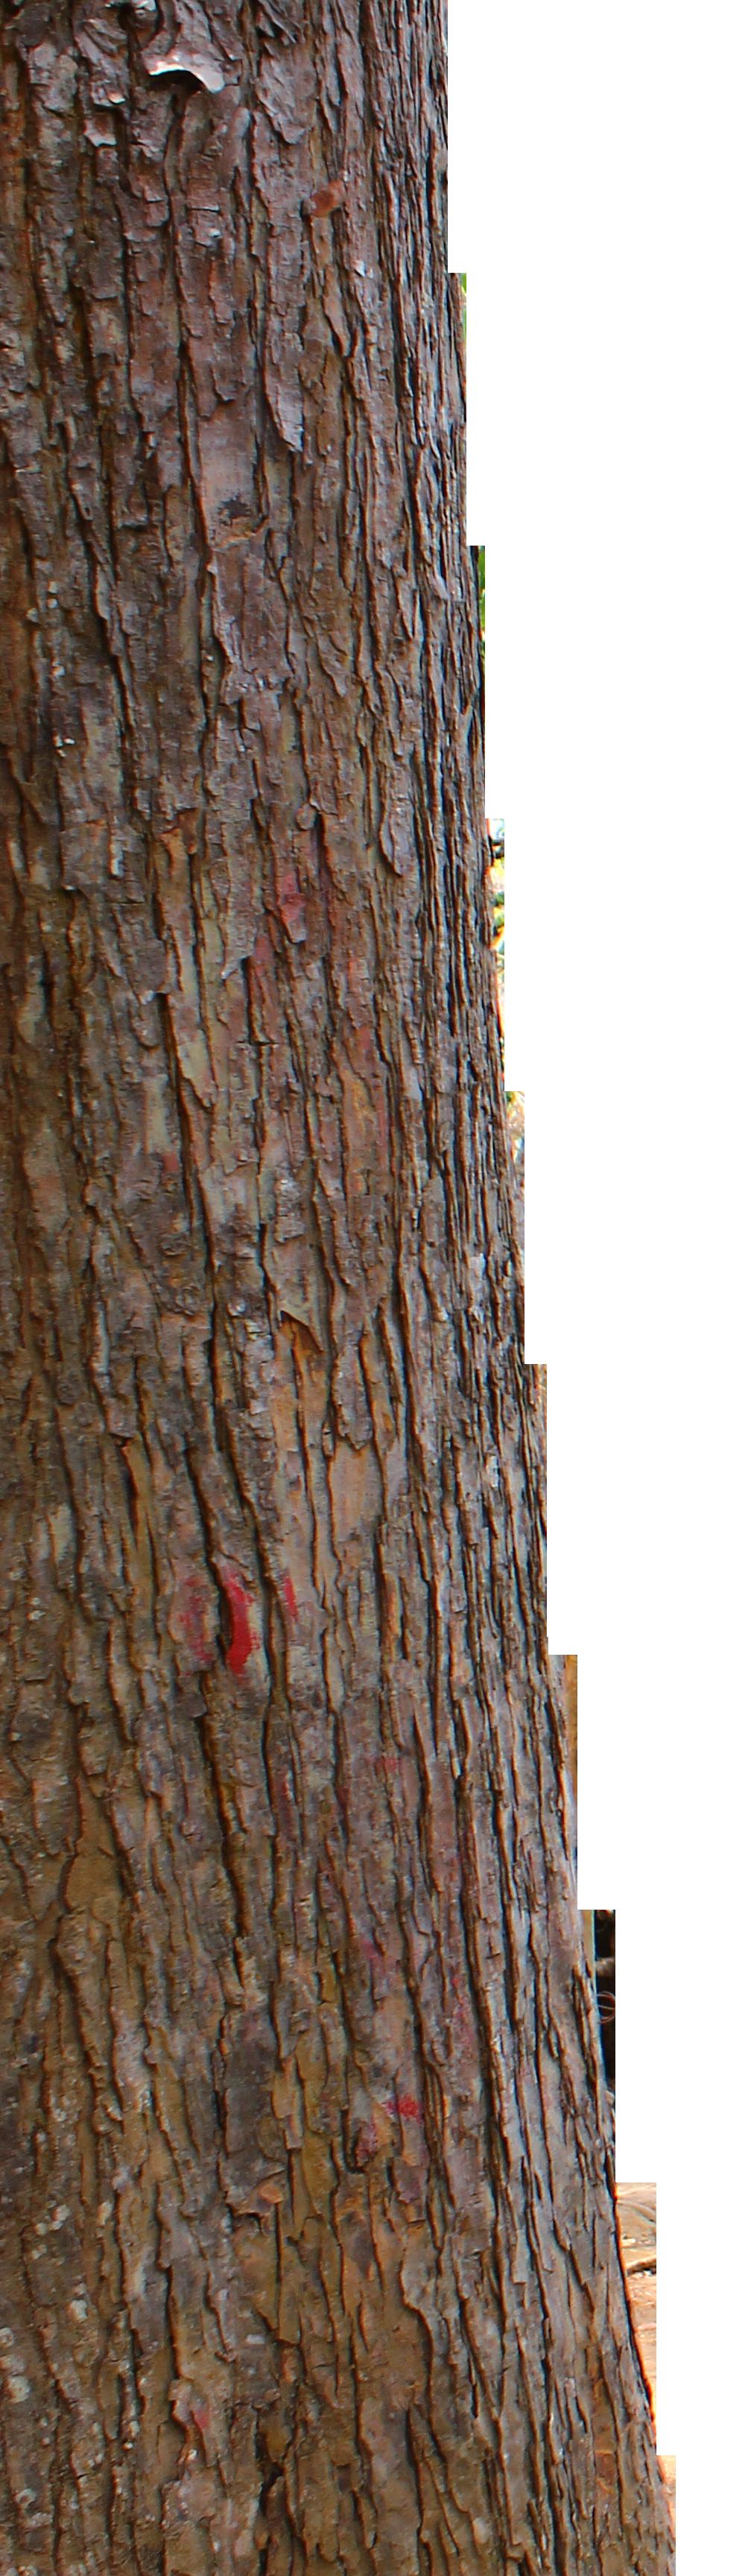 tree trunk by andhikazanuar on DeviantArt